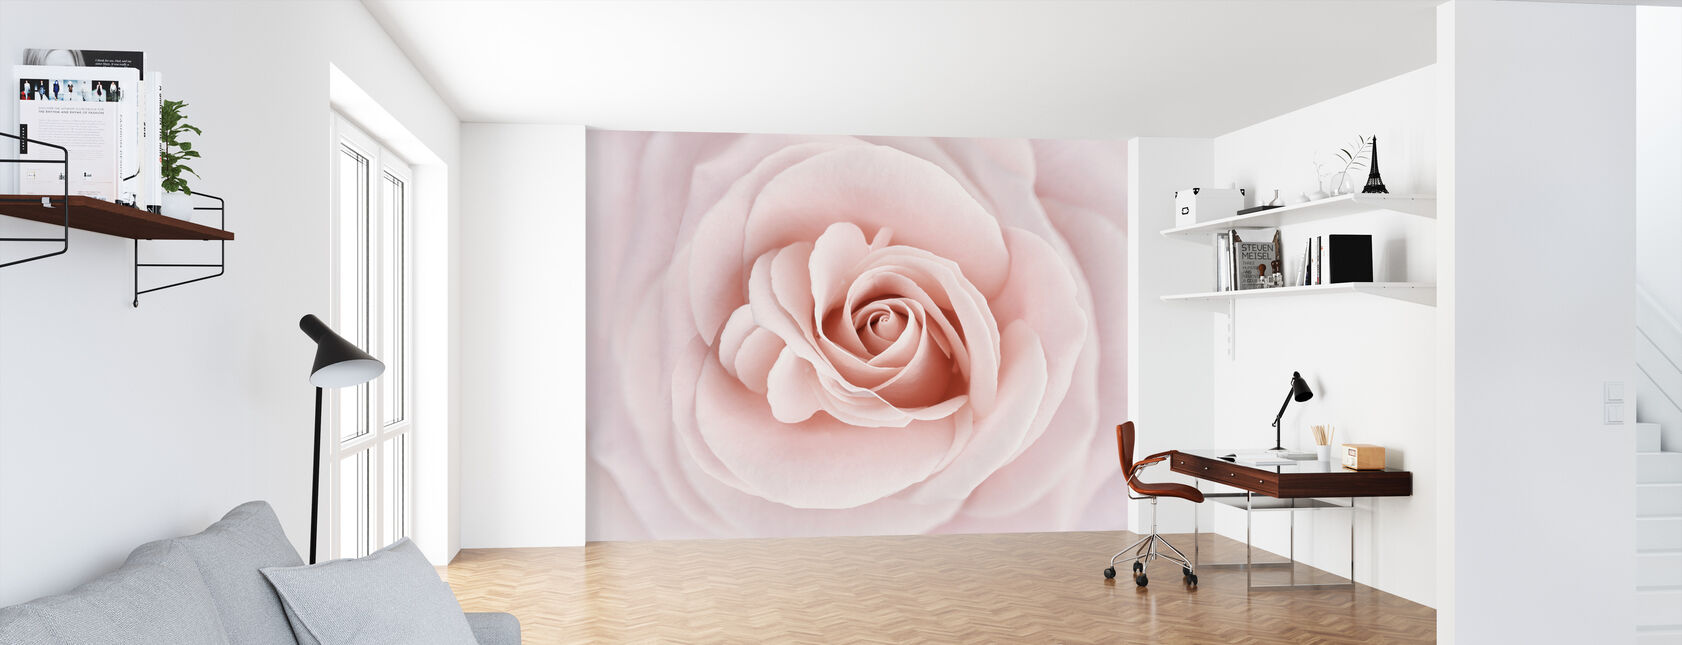 Soft Rose in Pfirsichrosa Farbtönen - Tapete - Büro